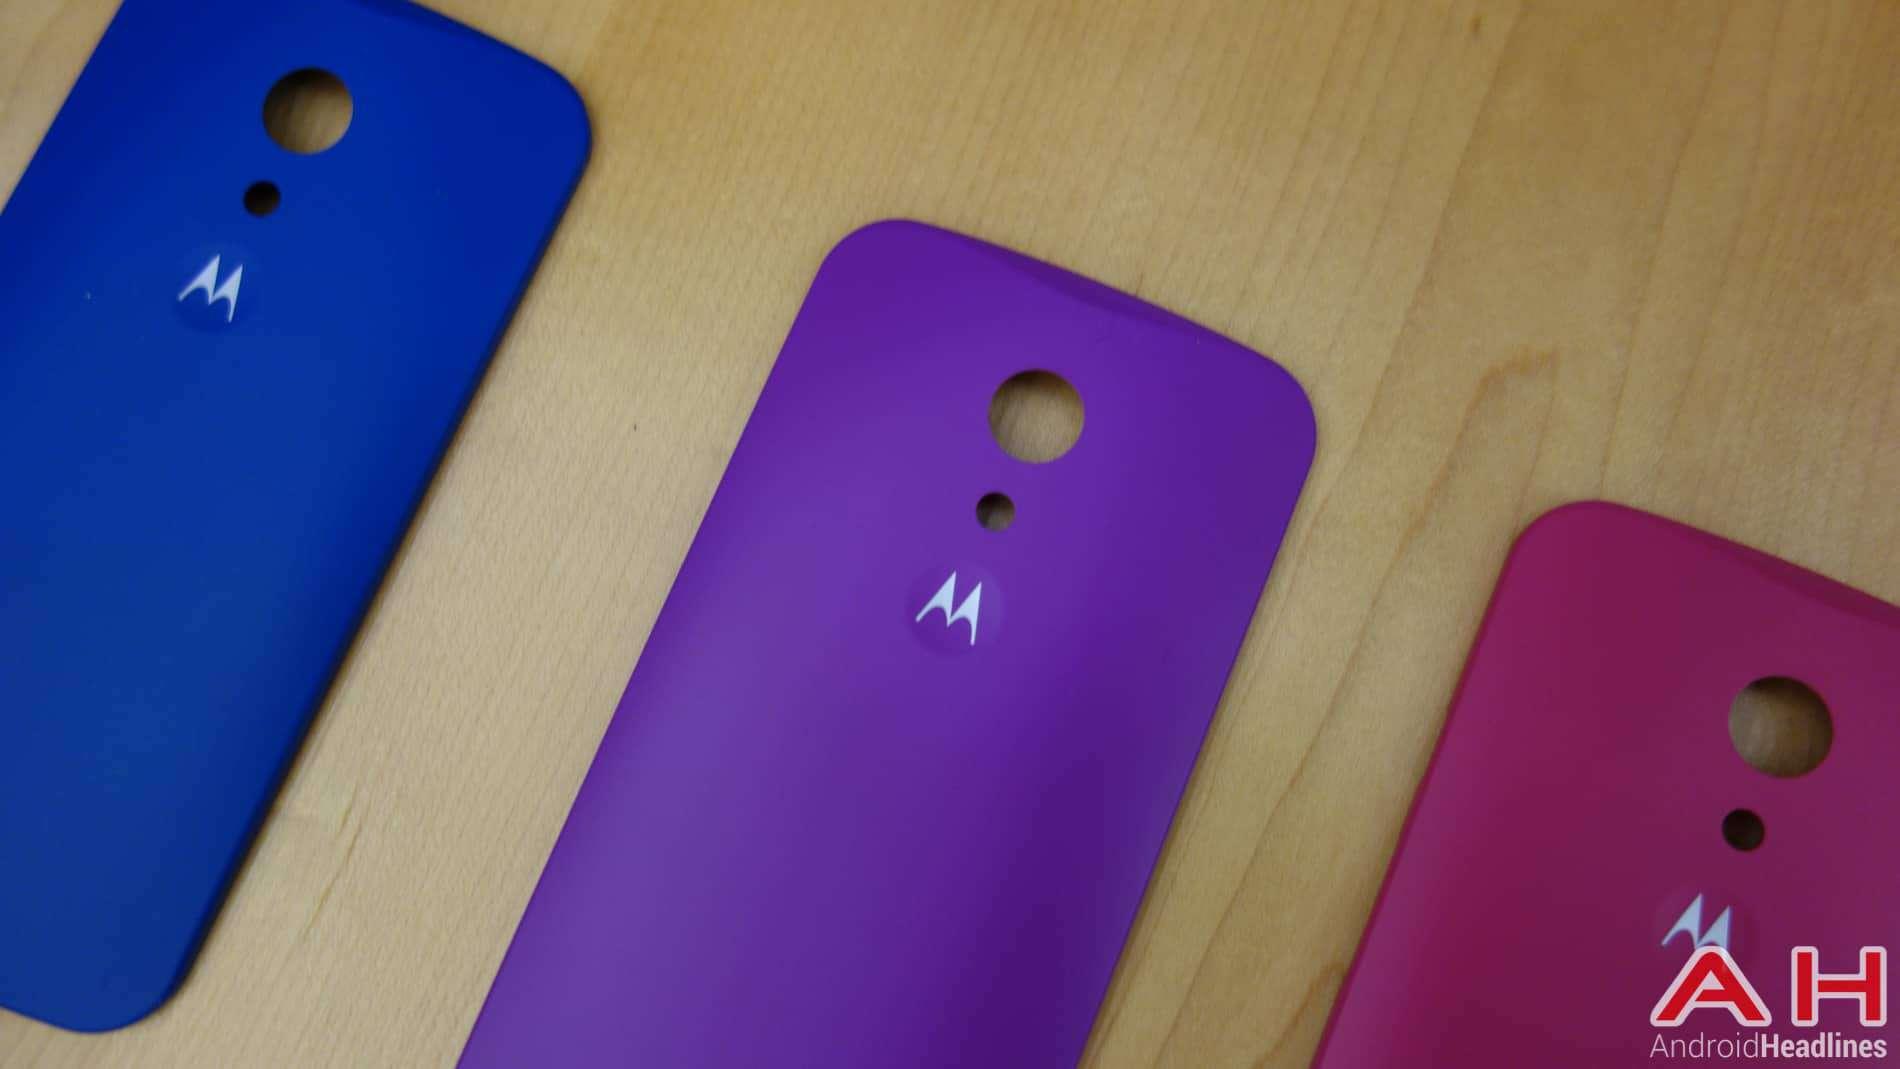 Motorola AH 210